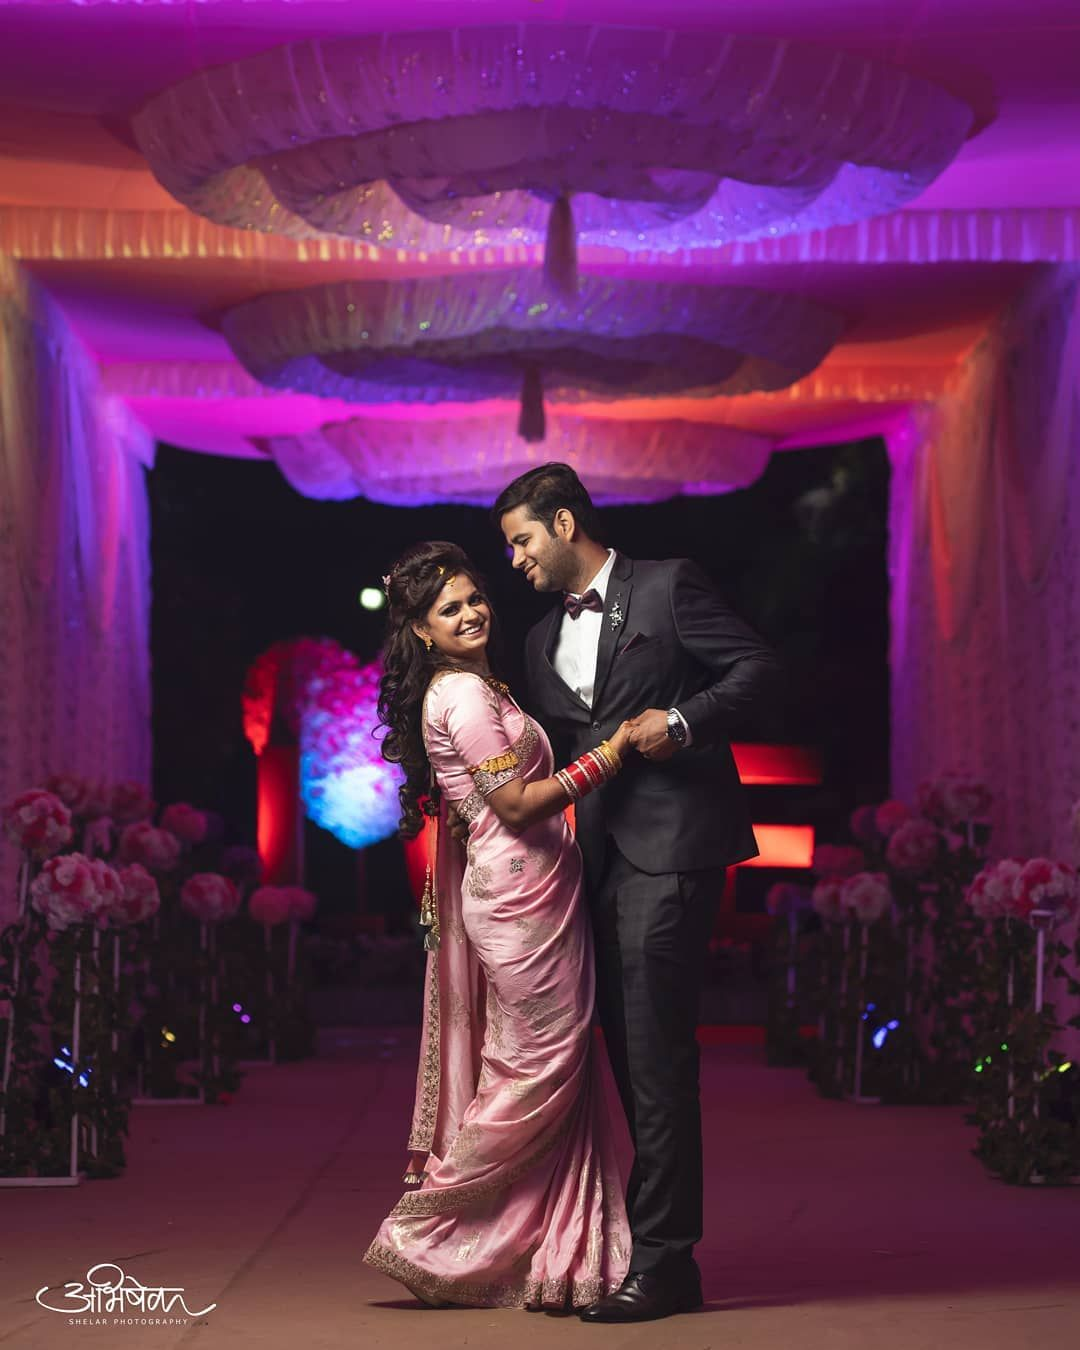 Vijay Surabhi Wedding Photography Ahmednagar Equipment Use Canon Eos Rp Canon 85mm Light With Godox V860 Ii Www Abhishekshelar Com 814 9 815 81 I 2020